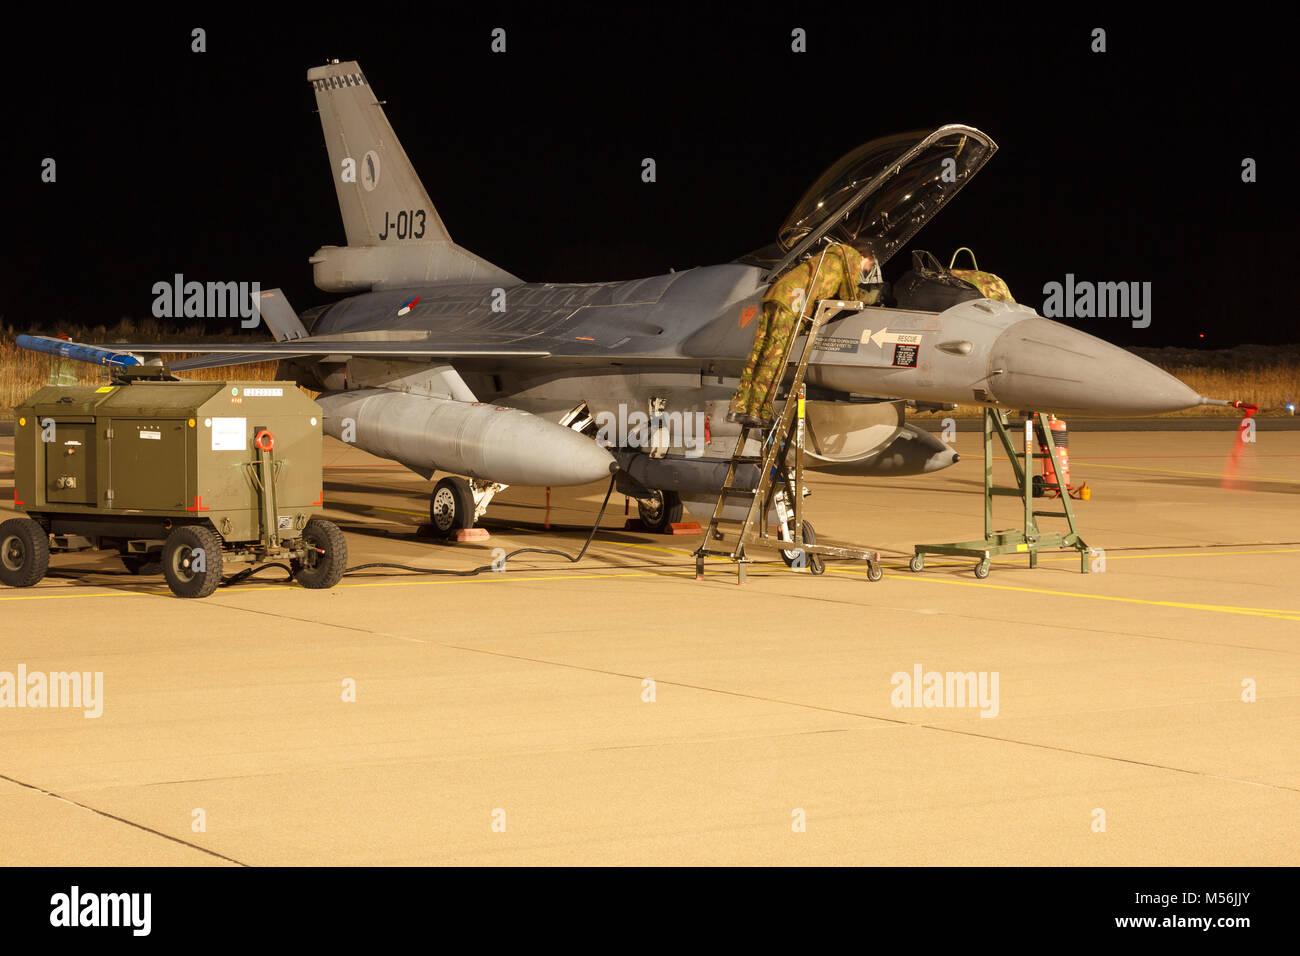 Leeuwarden Feb 6 2018: Night flight Exercise. Mechanics inspecting an F-16 Fighting Falcon. - Stock Image